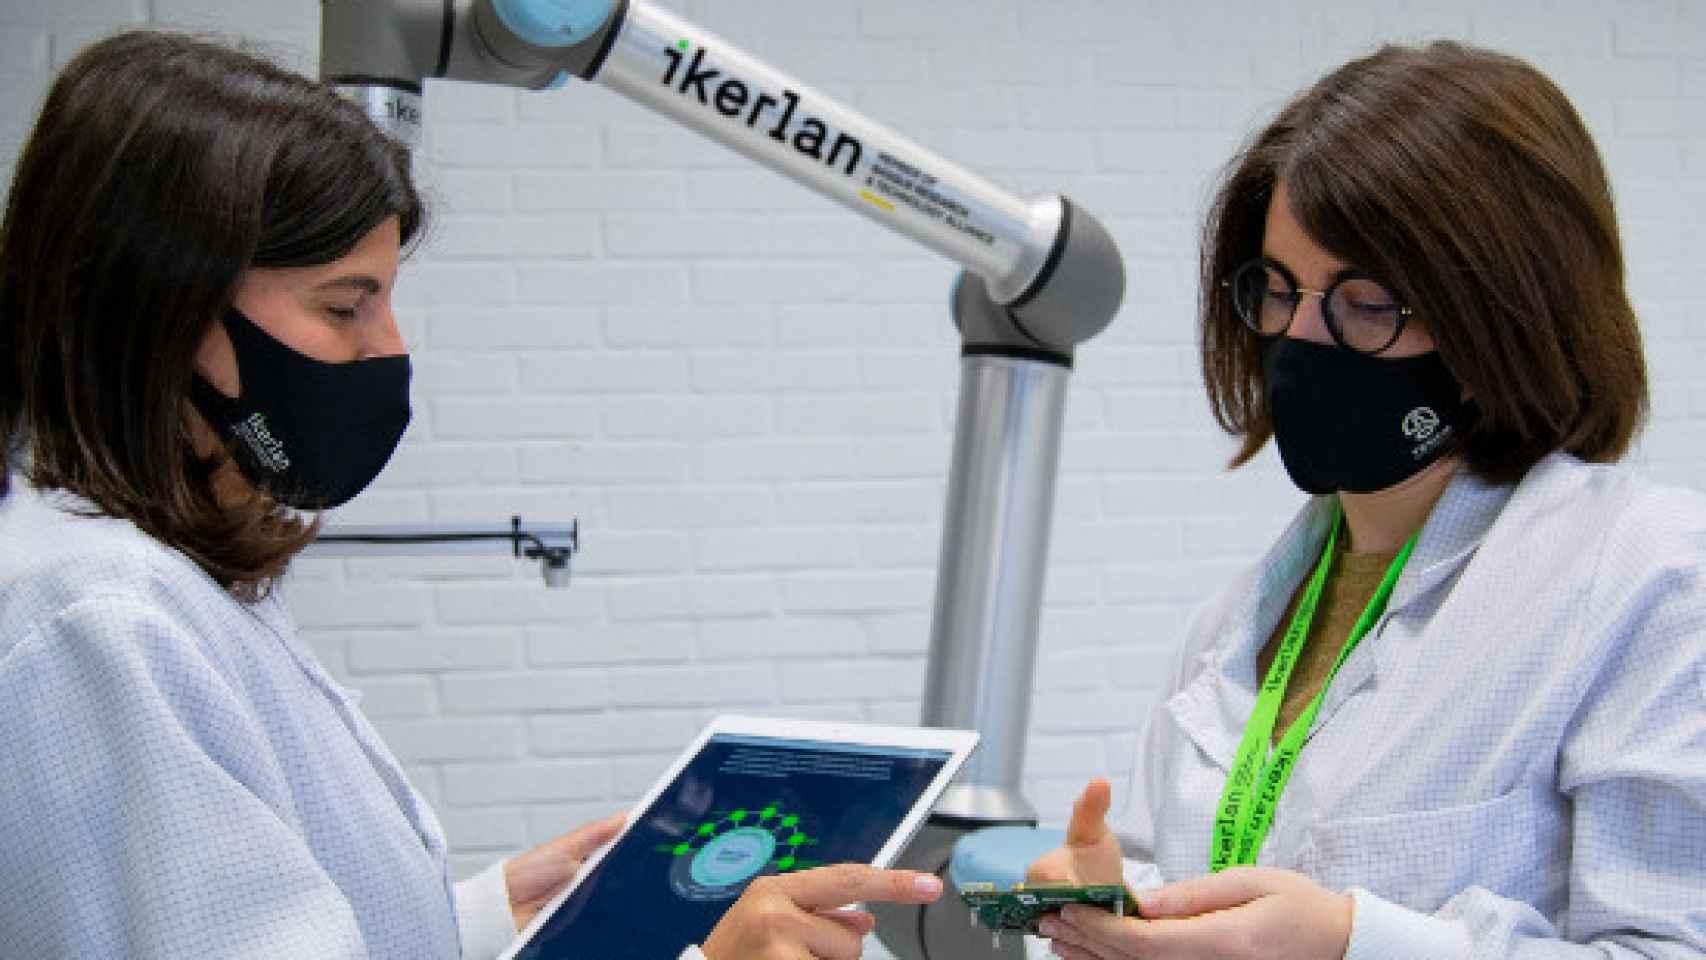 Dos investigadoras del Centro Tecnológico Vasco Ikerlan.